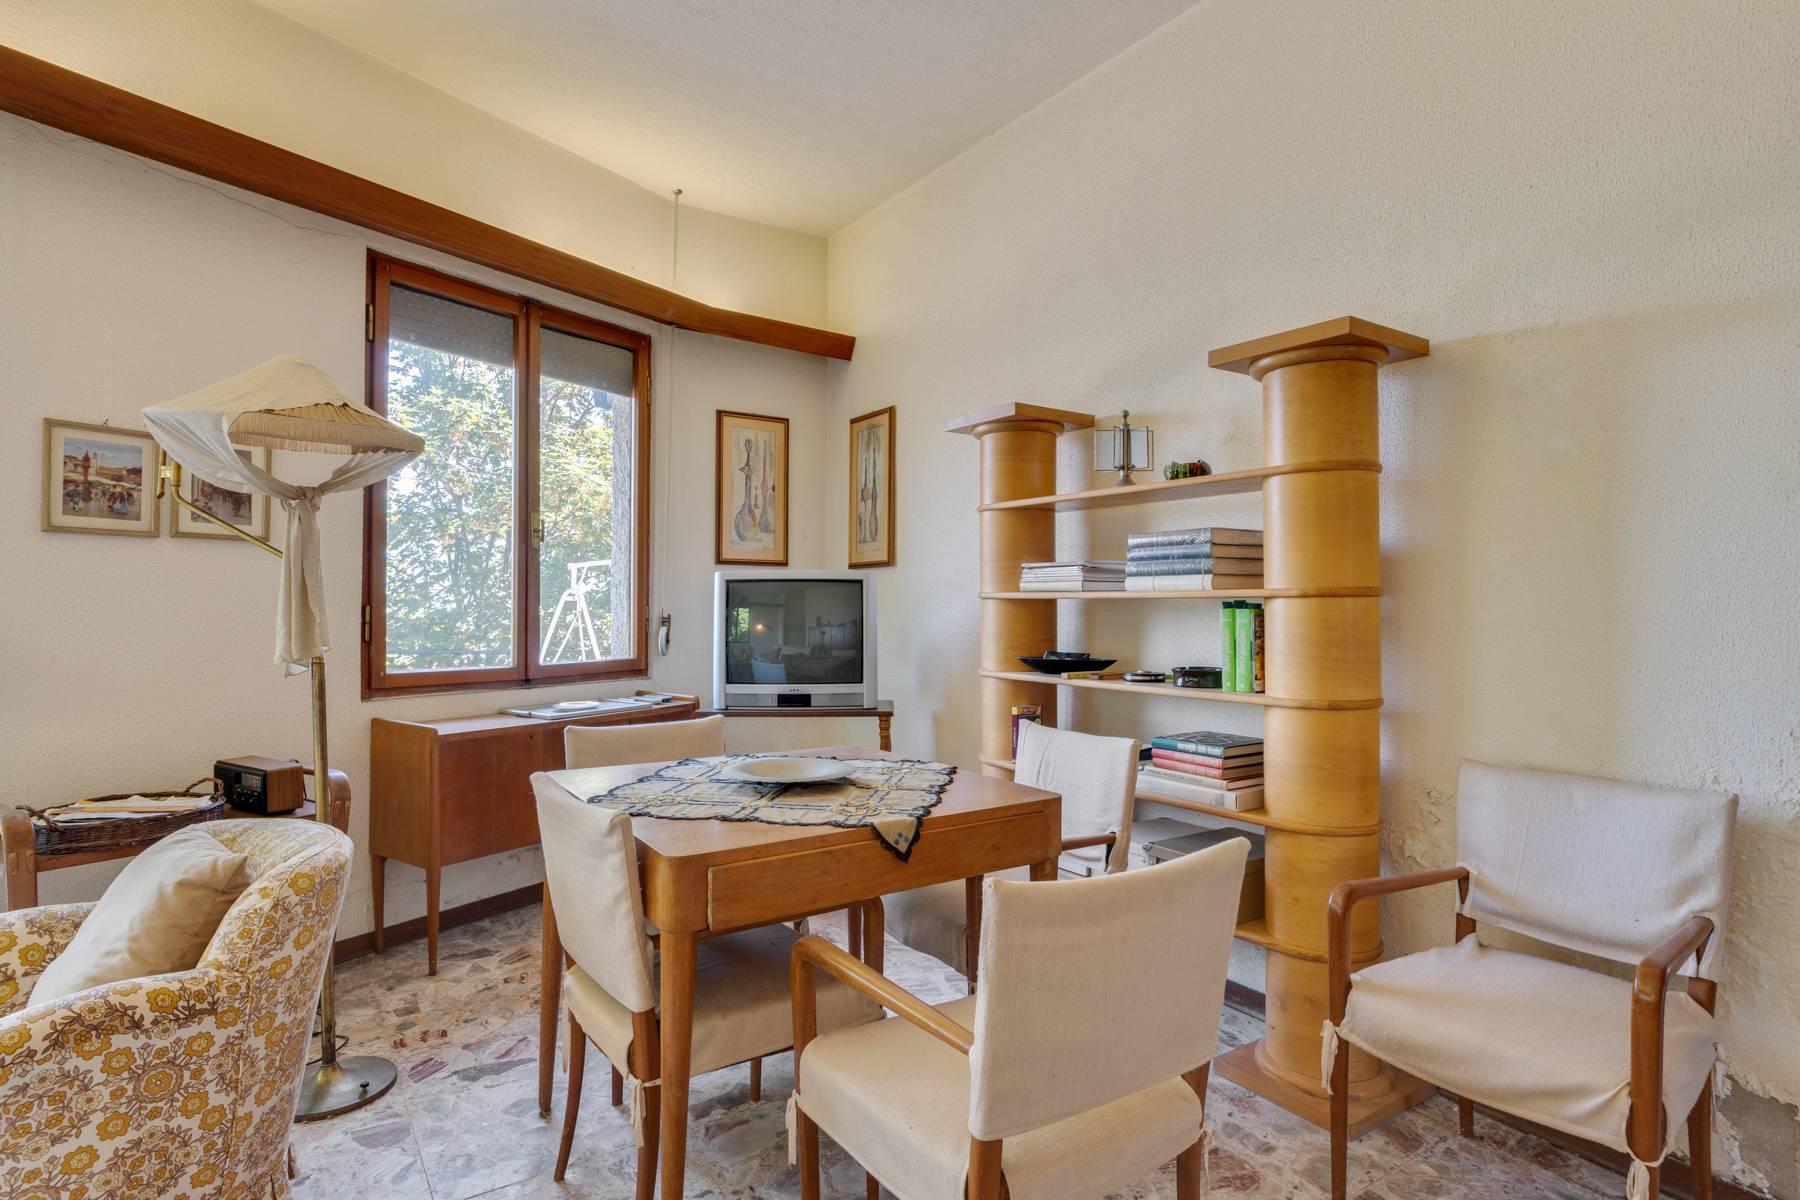 Villa in Vendita a Stresa: 5 locali, 150 mq - Foto 10